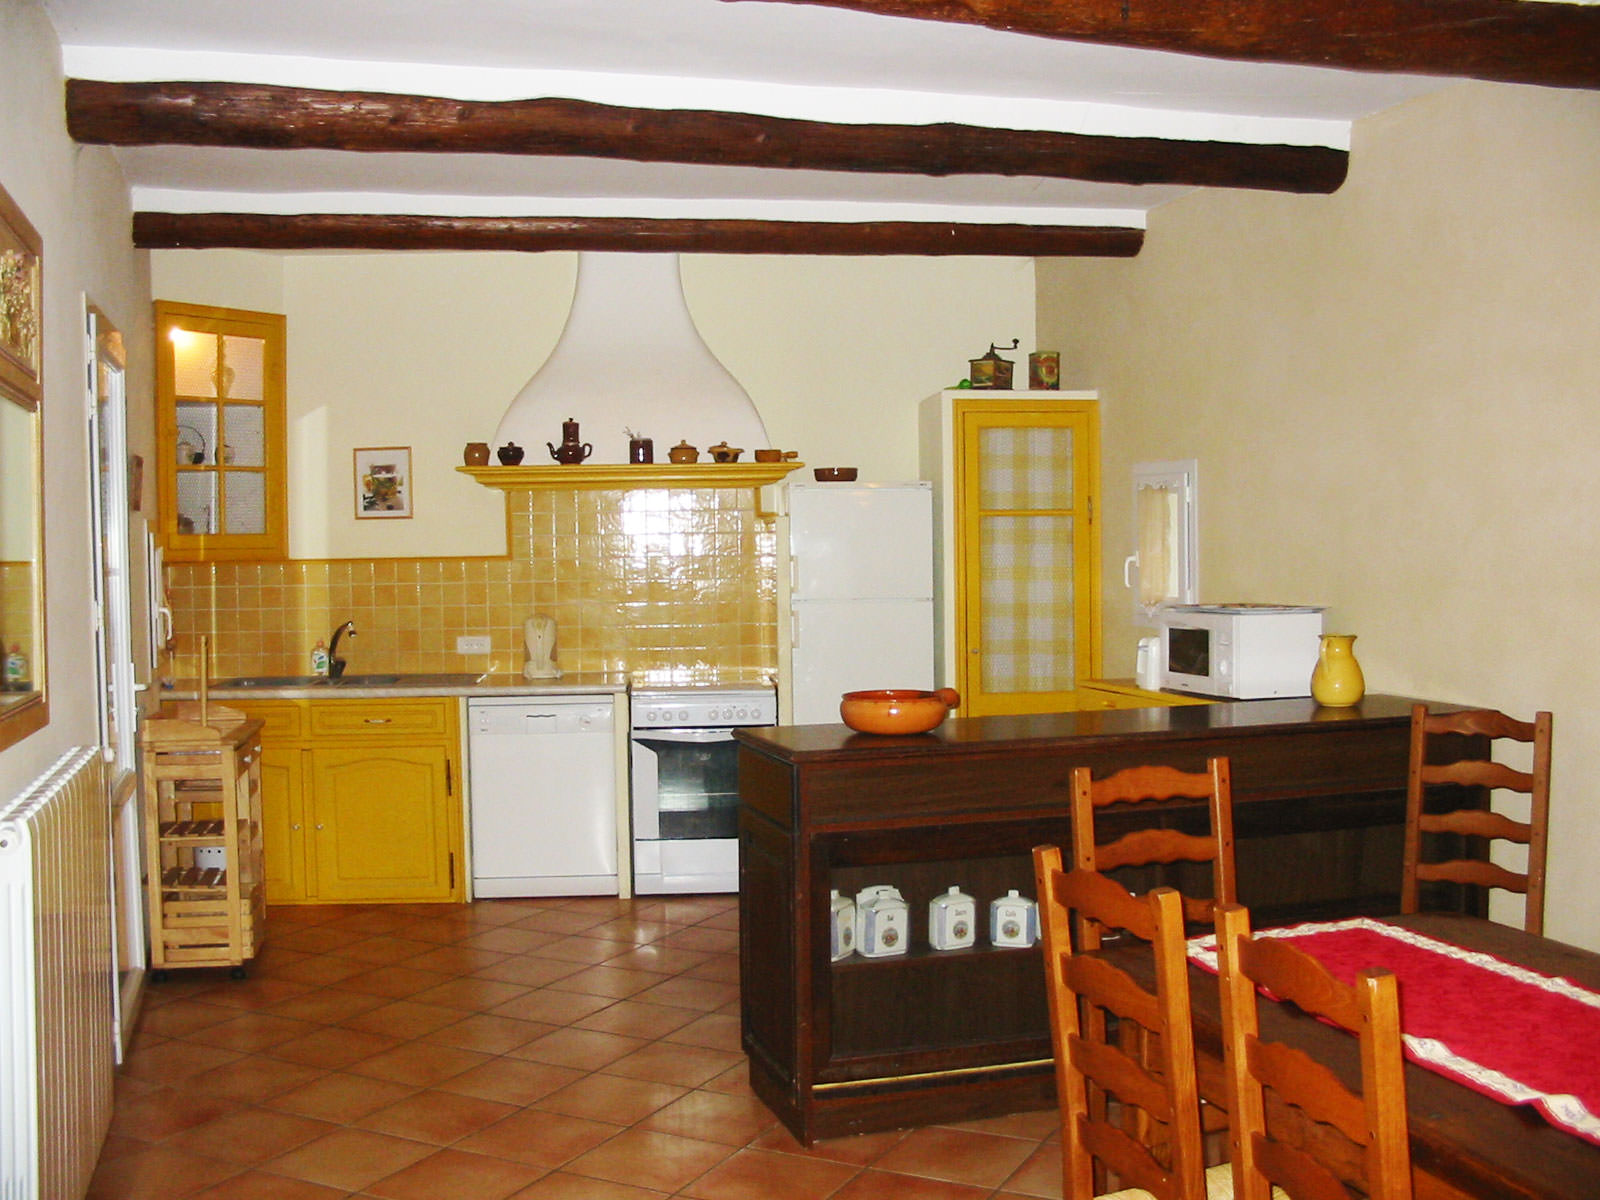 http://www.masgabriel.com/gite-luberon-provence/wp-content/uploads/2014/02/cuisine-mas-gabriel-003.jpg